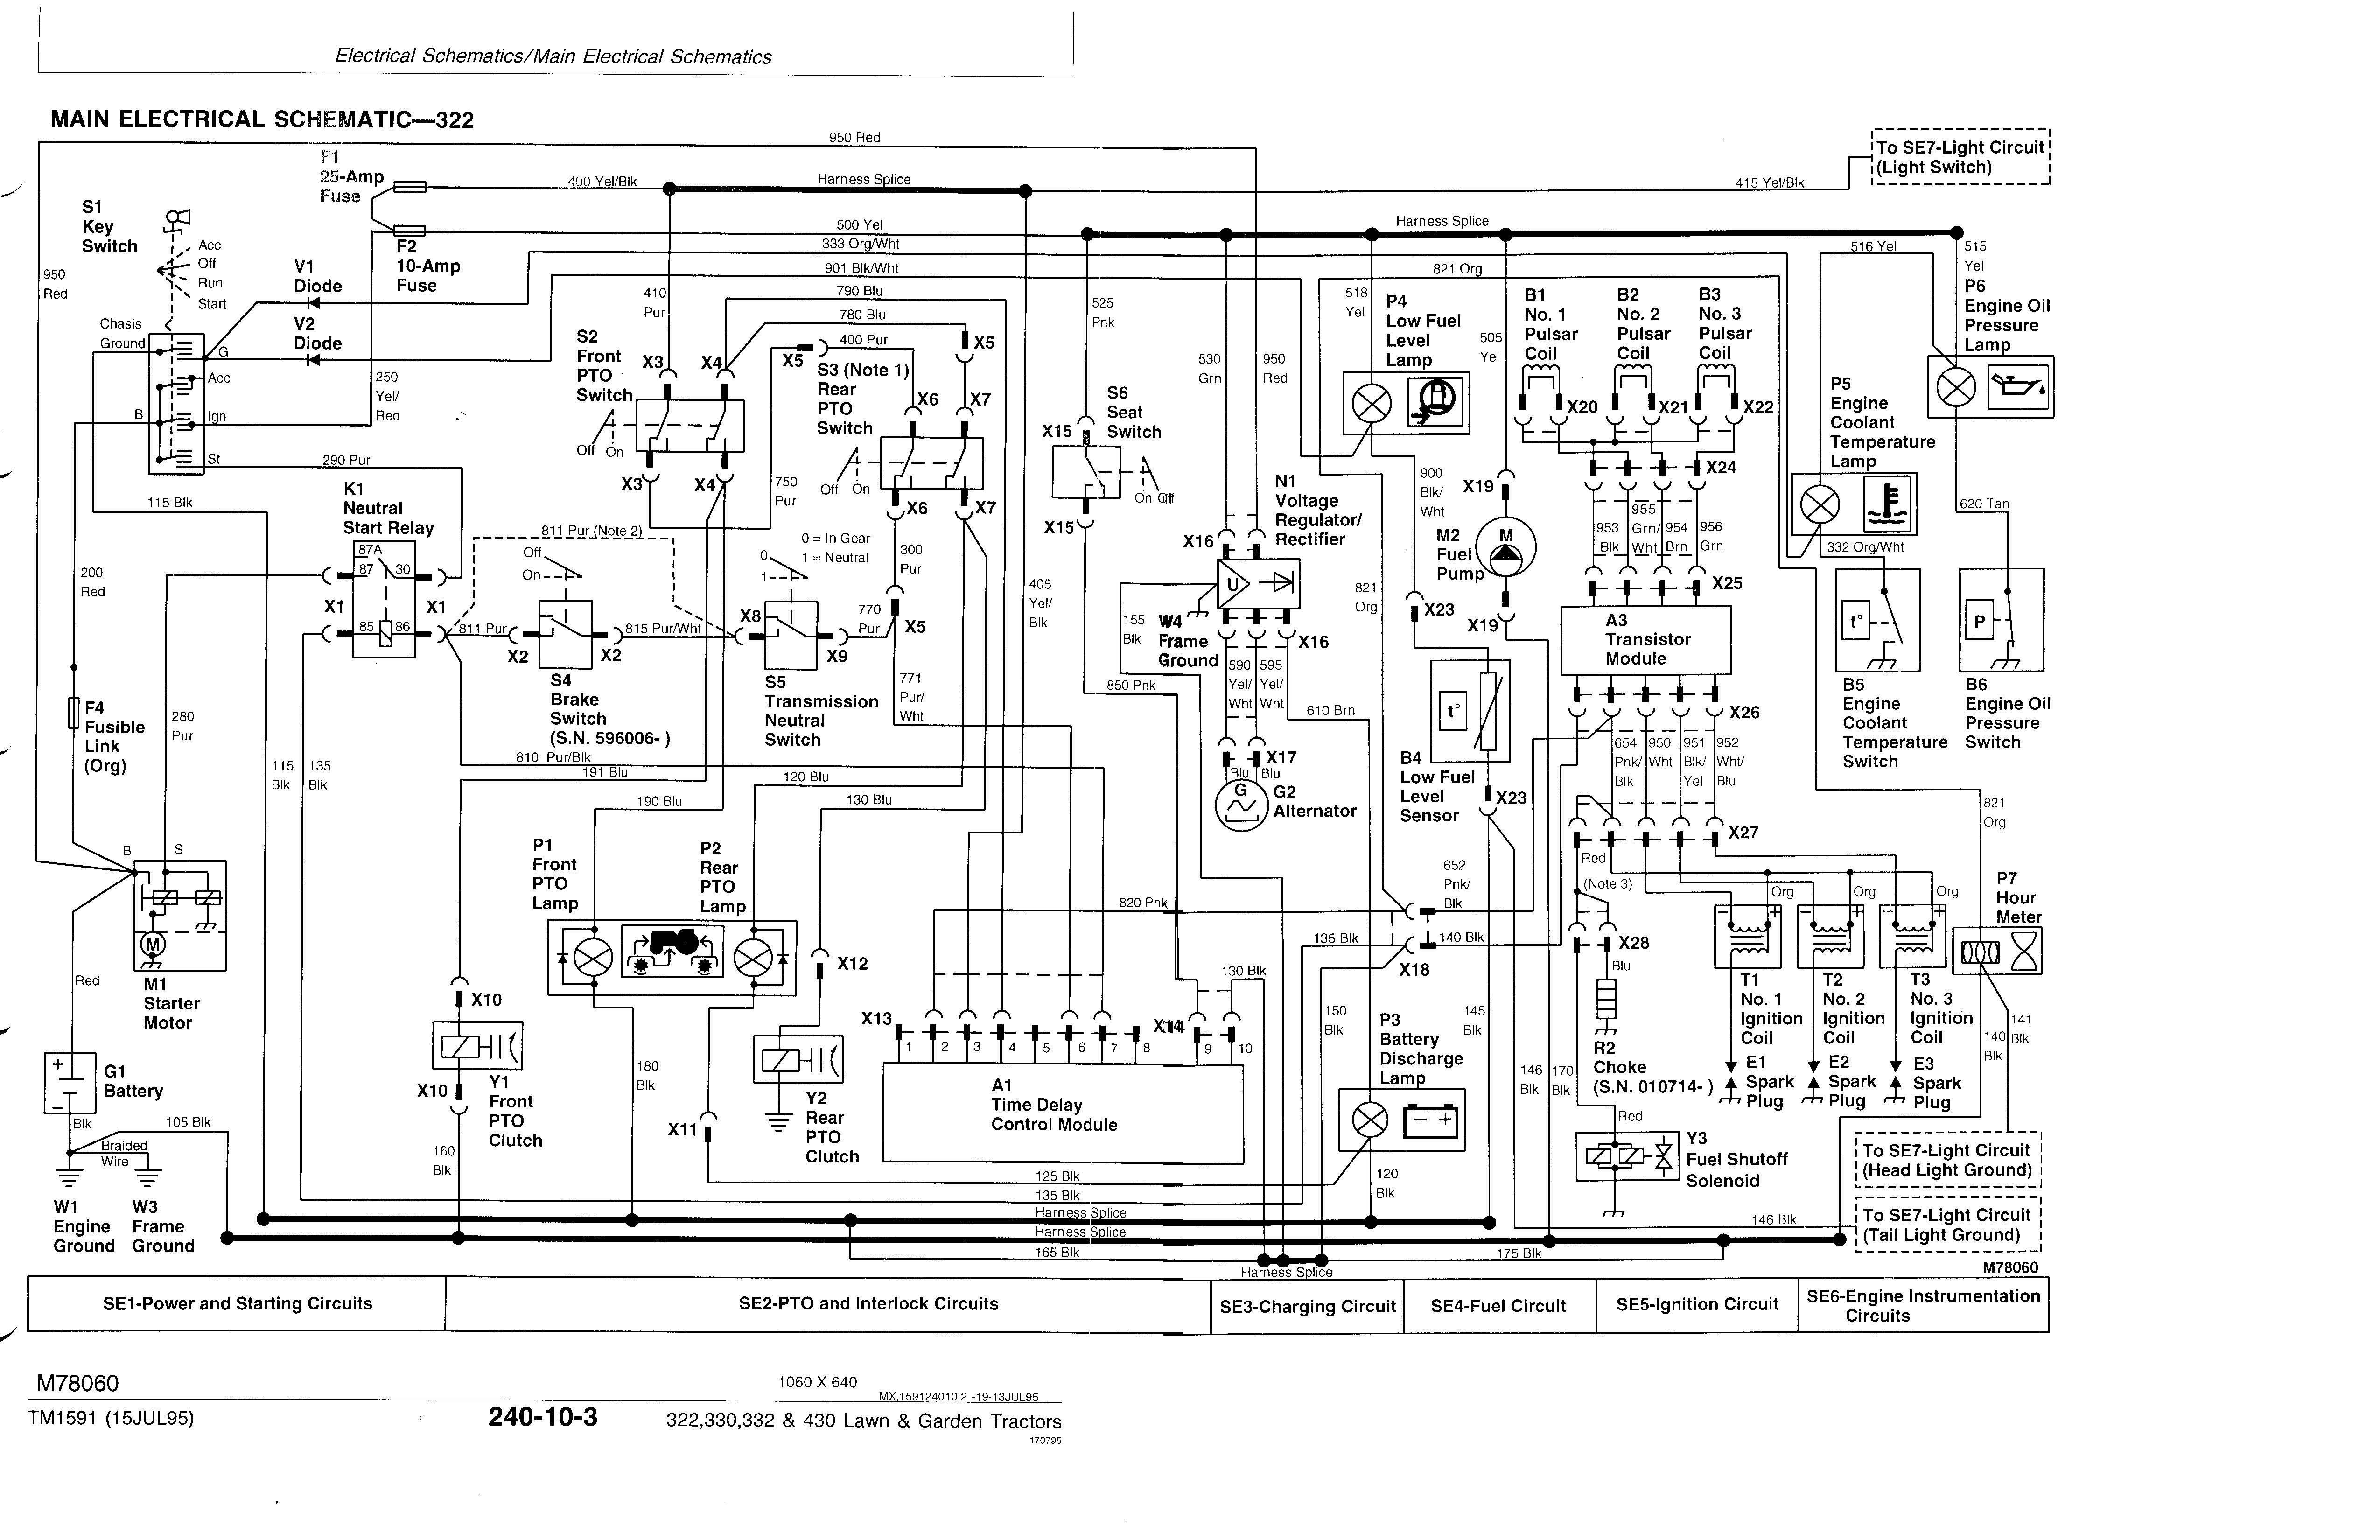 Diagram John Deere 6320 Wiring Diagram Full Version Hd Quality Wiring Diagram Mediagrame Artisan Marescot Fr